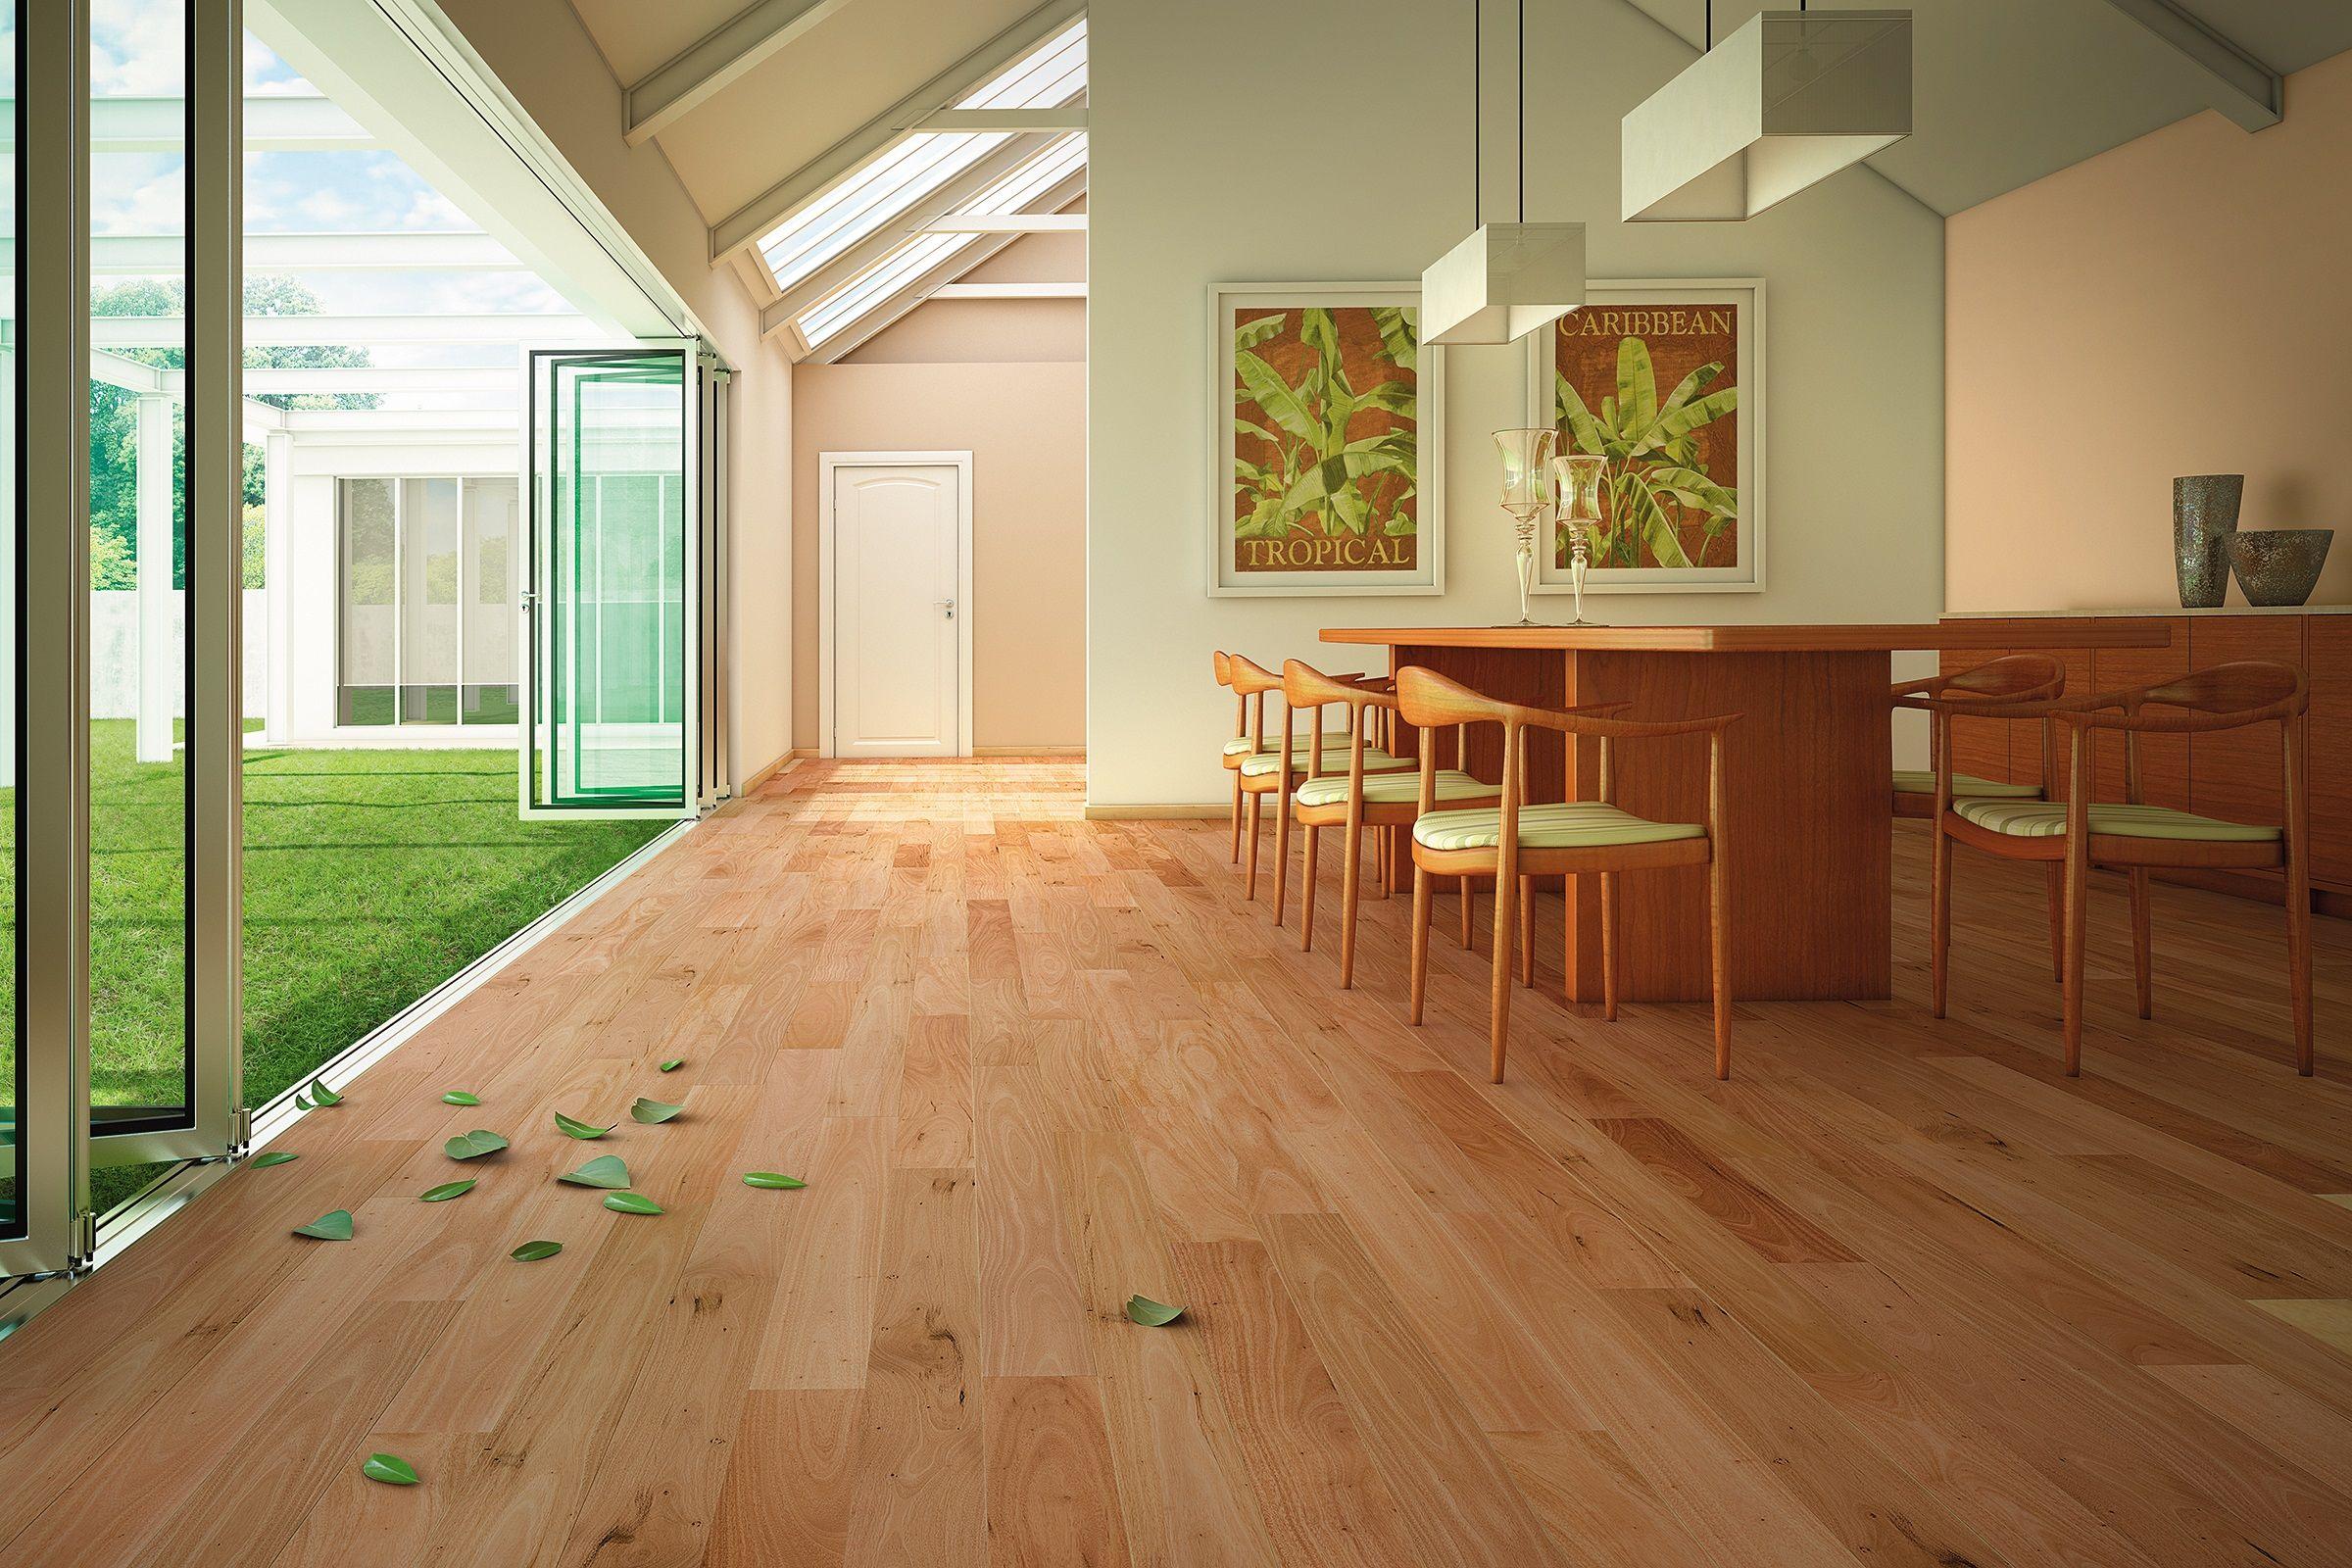 Brazilian Amendoim Engineered Hardwood Floor Decor Engineered Hardwood Hardwood Floors Solid Hardwood